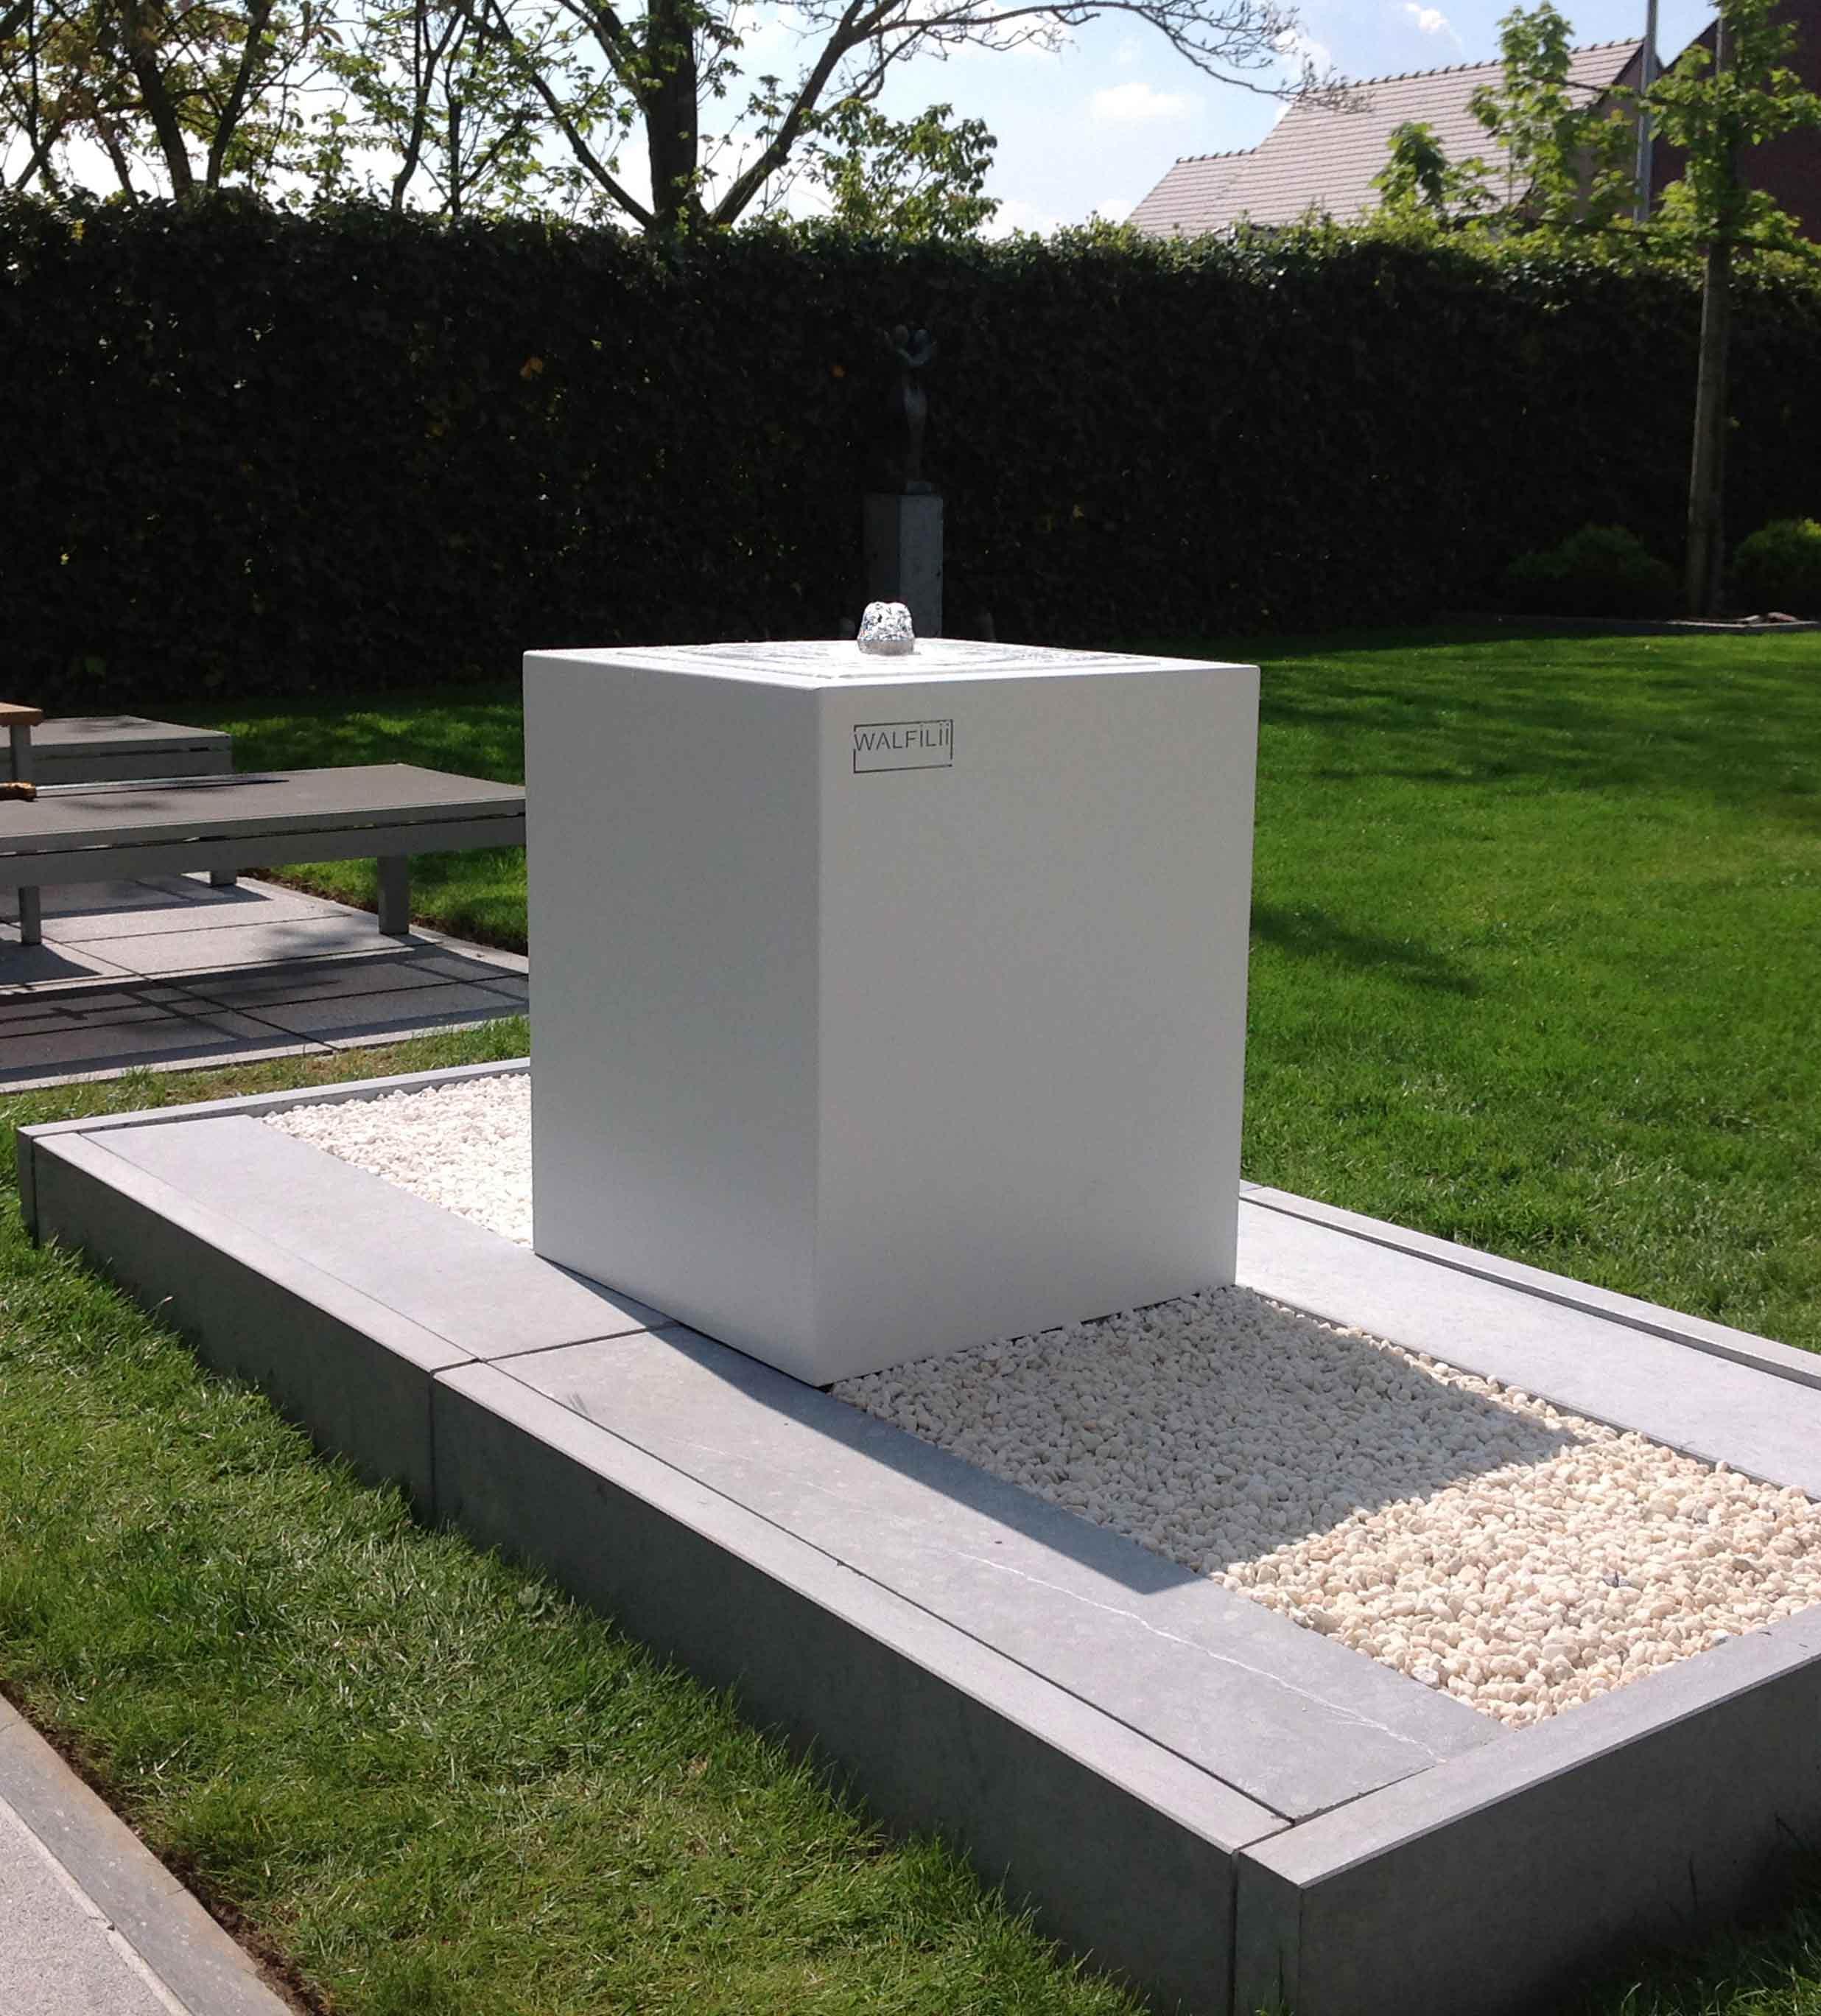 walfilii-realisaties-tuin-waterelement-waterbak-fontein-design